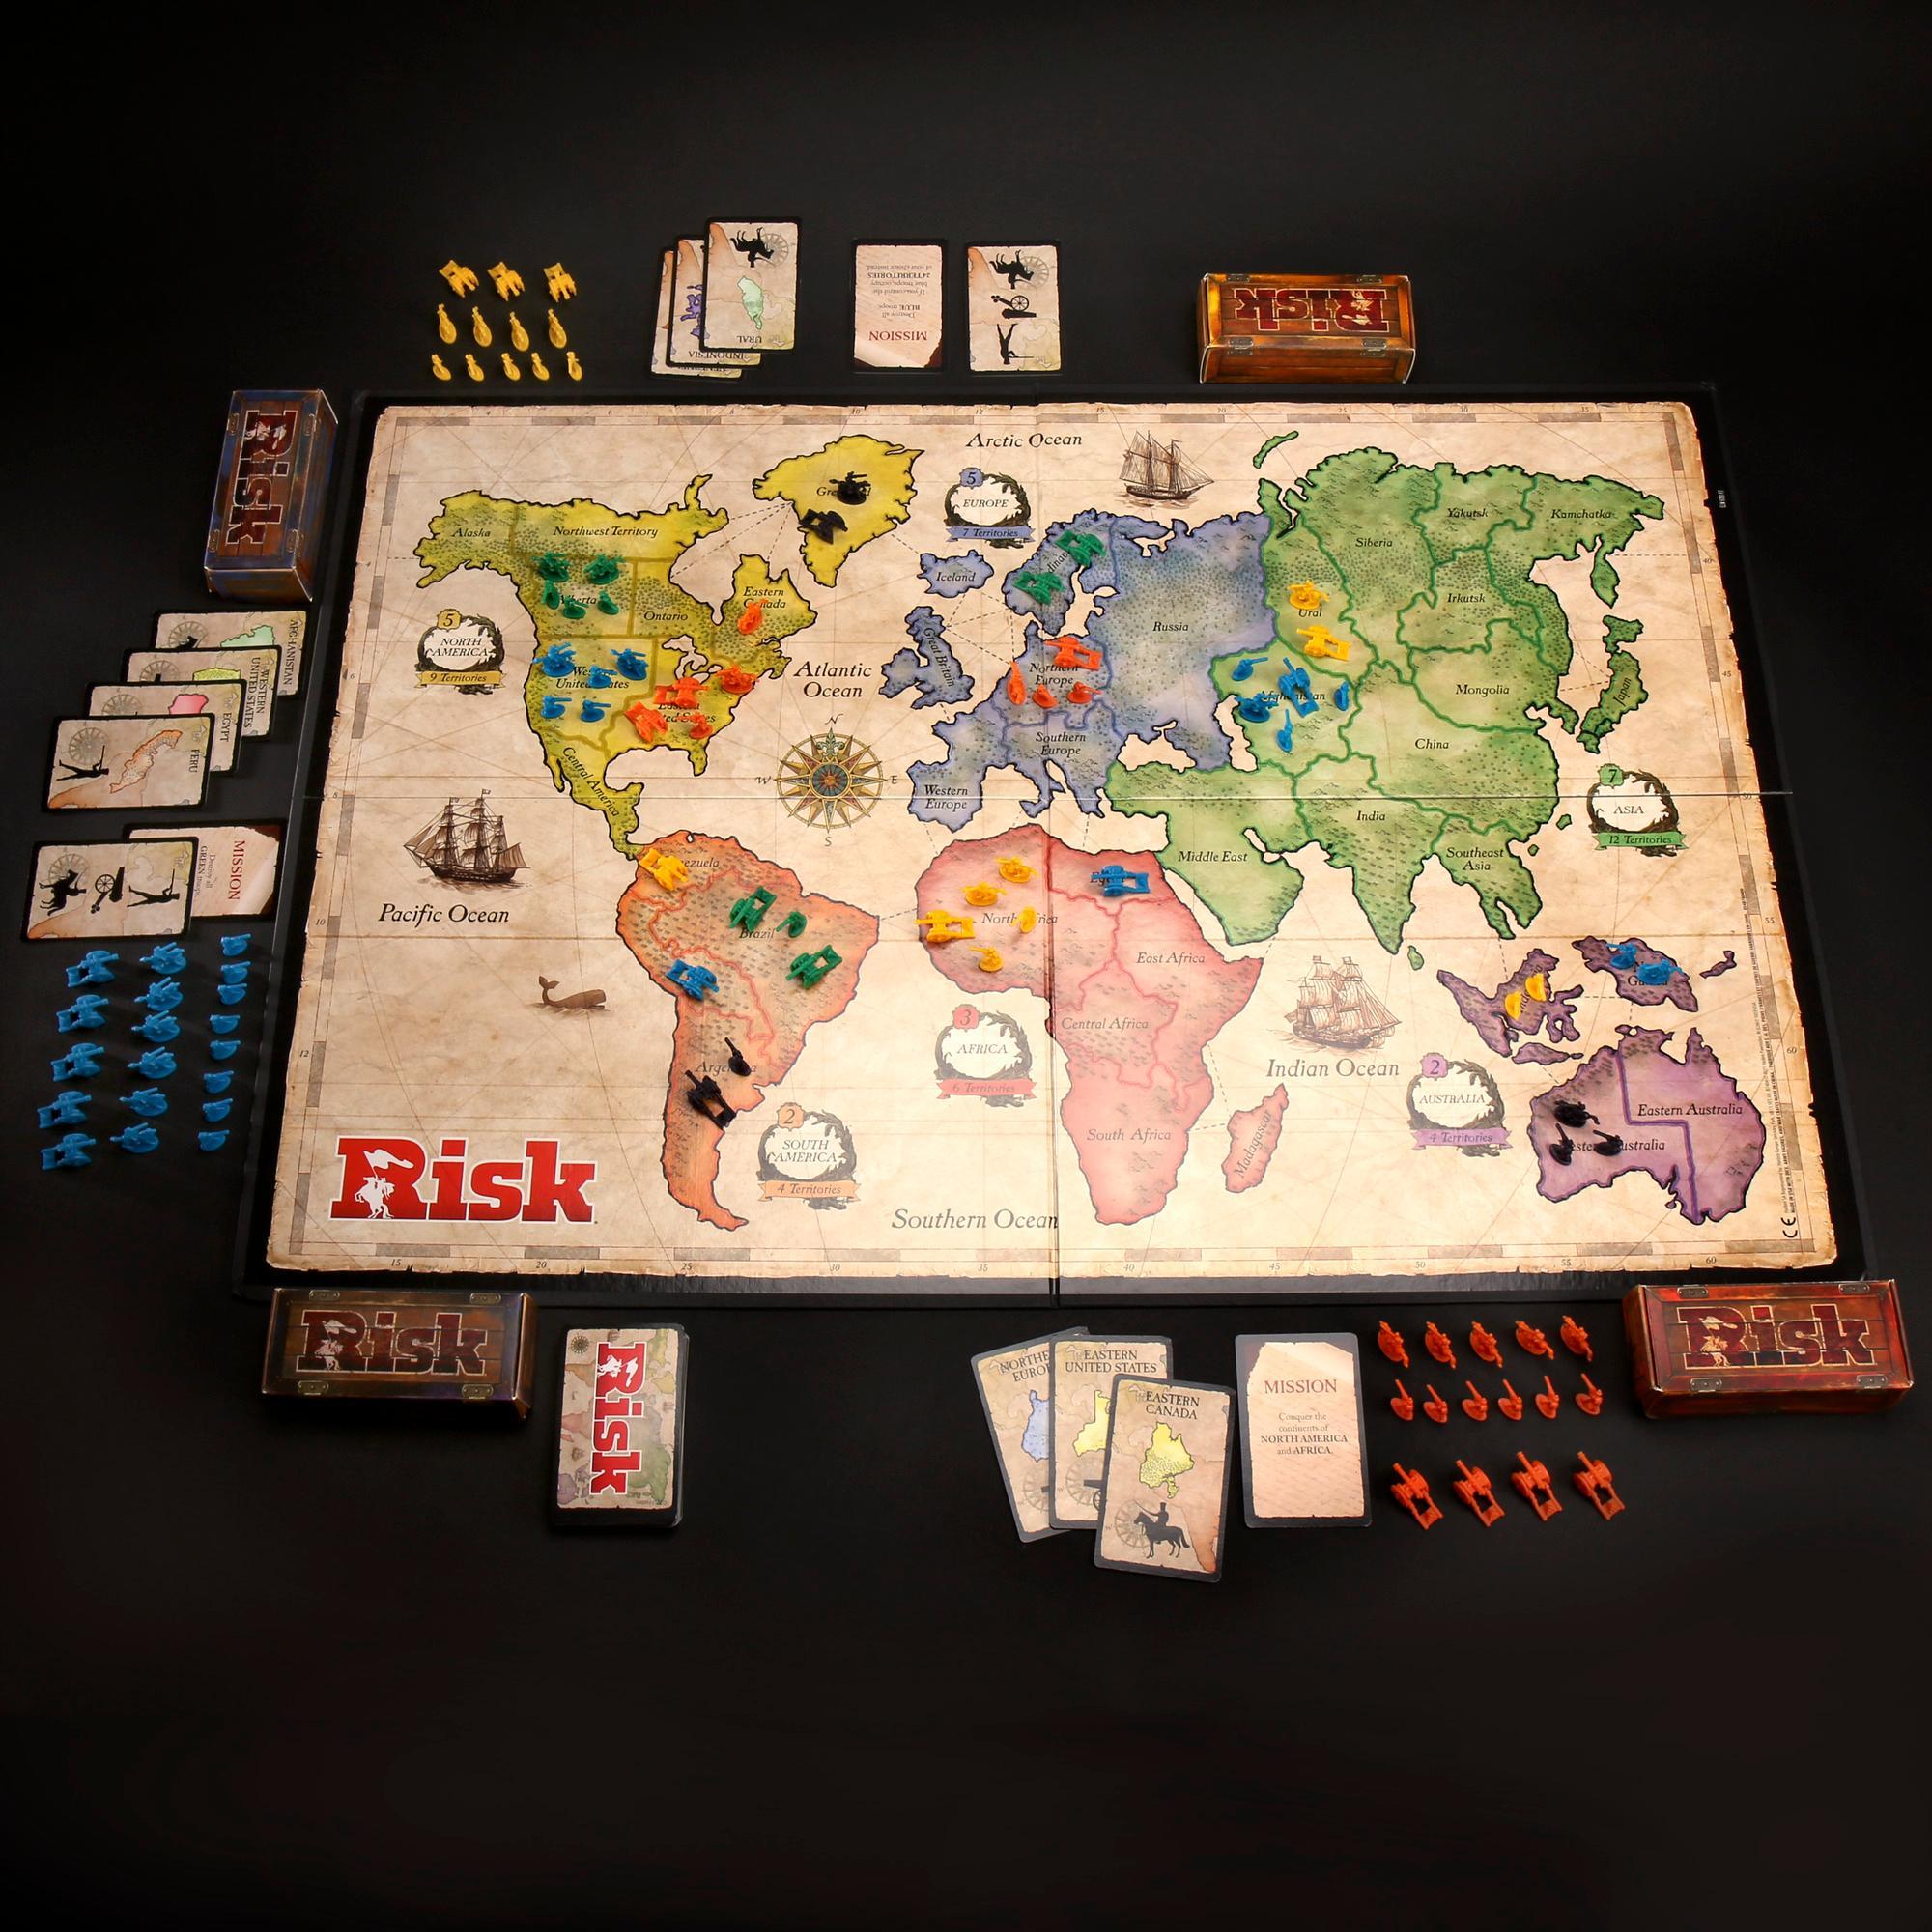 Spiel Risiko